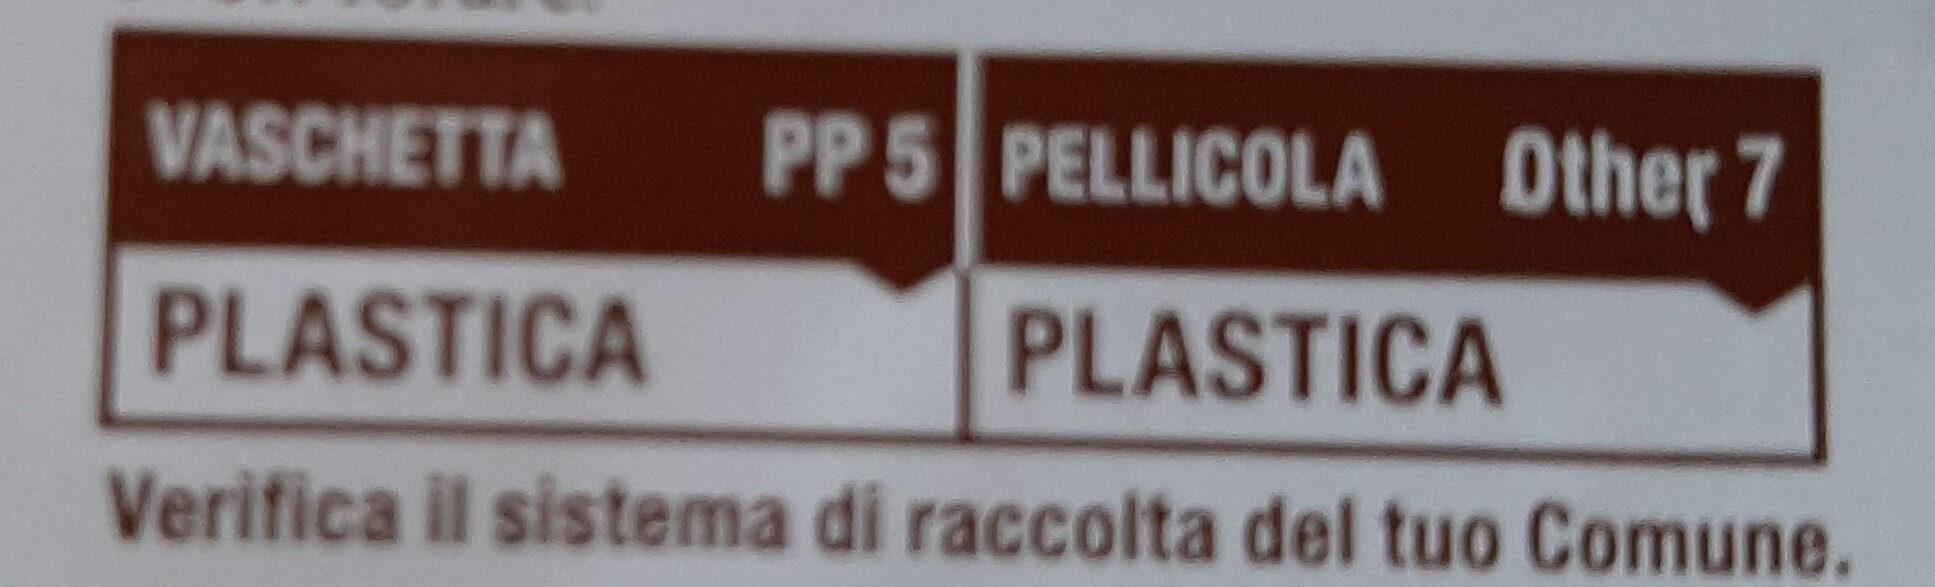 Ravioli alla borragine - Instruction de recyclage et/ou information d'emballage - it